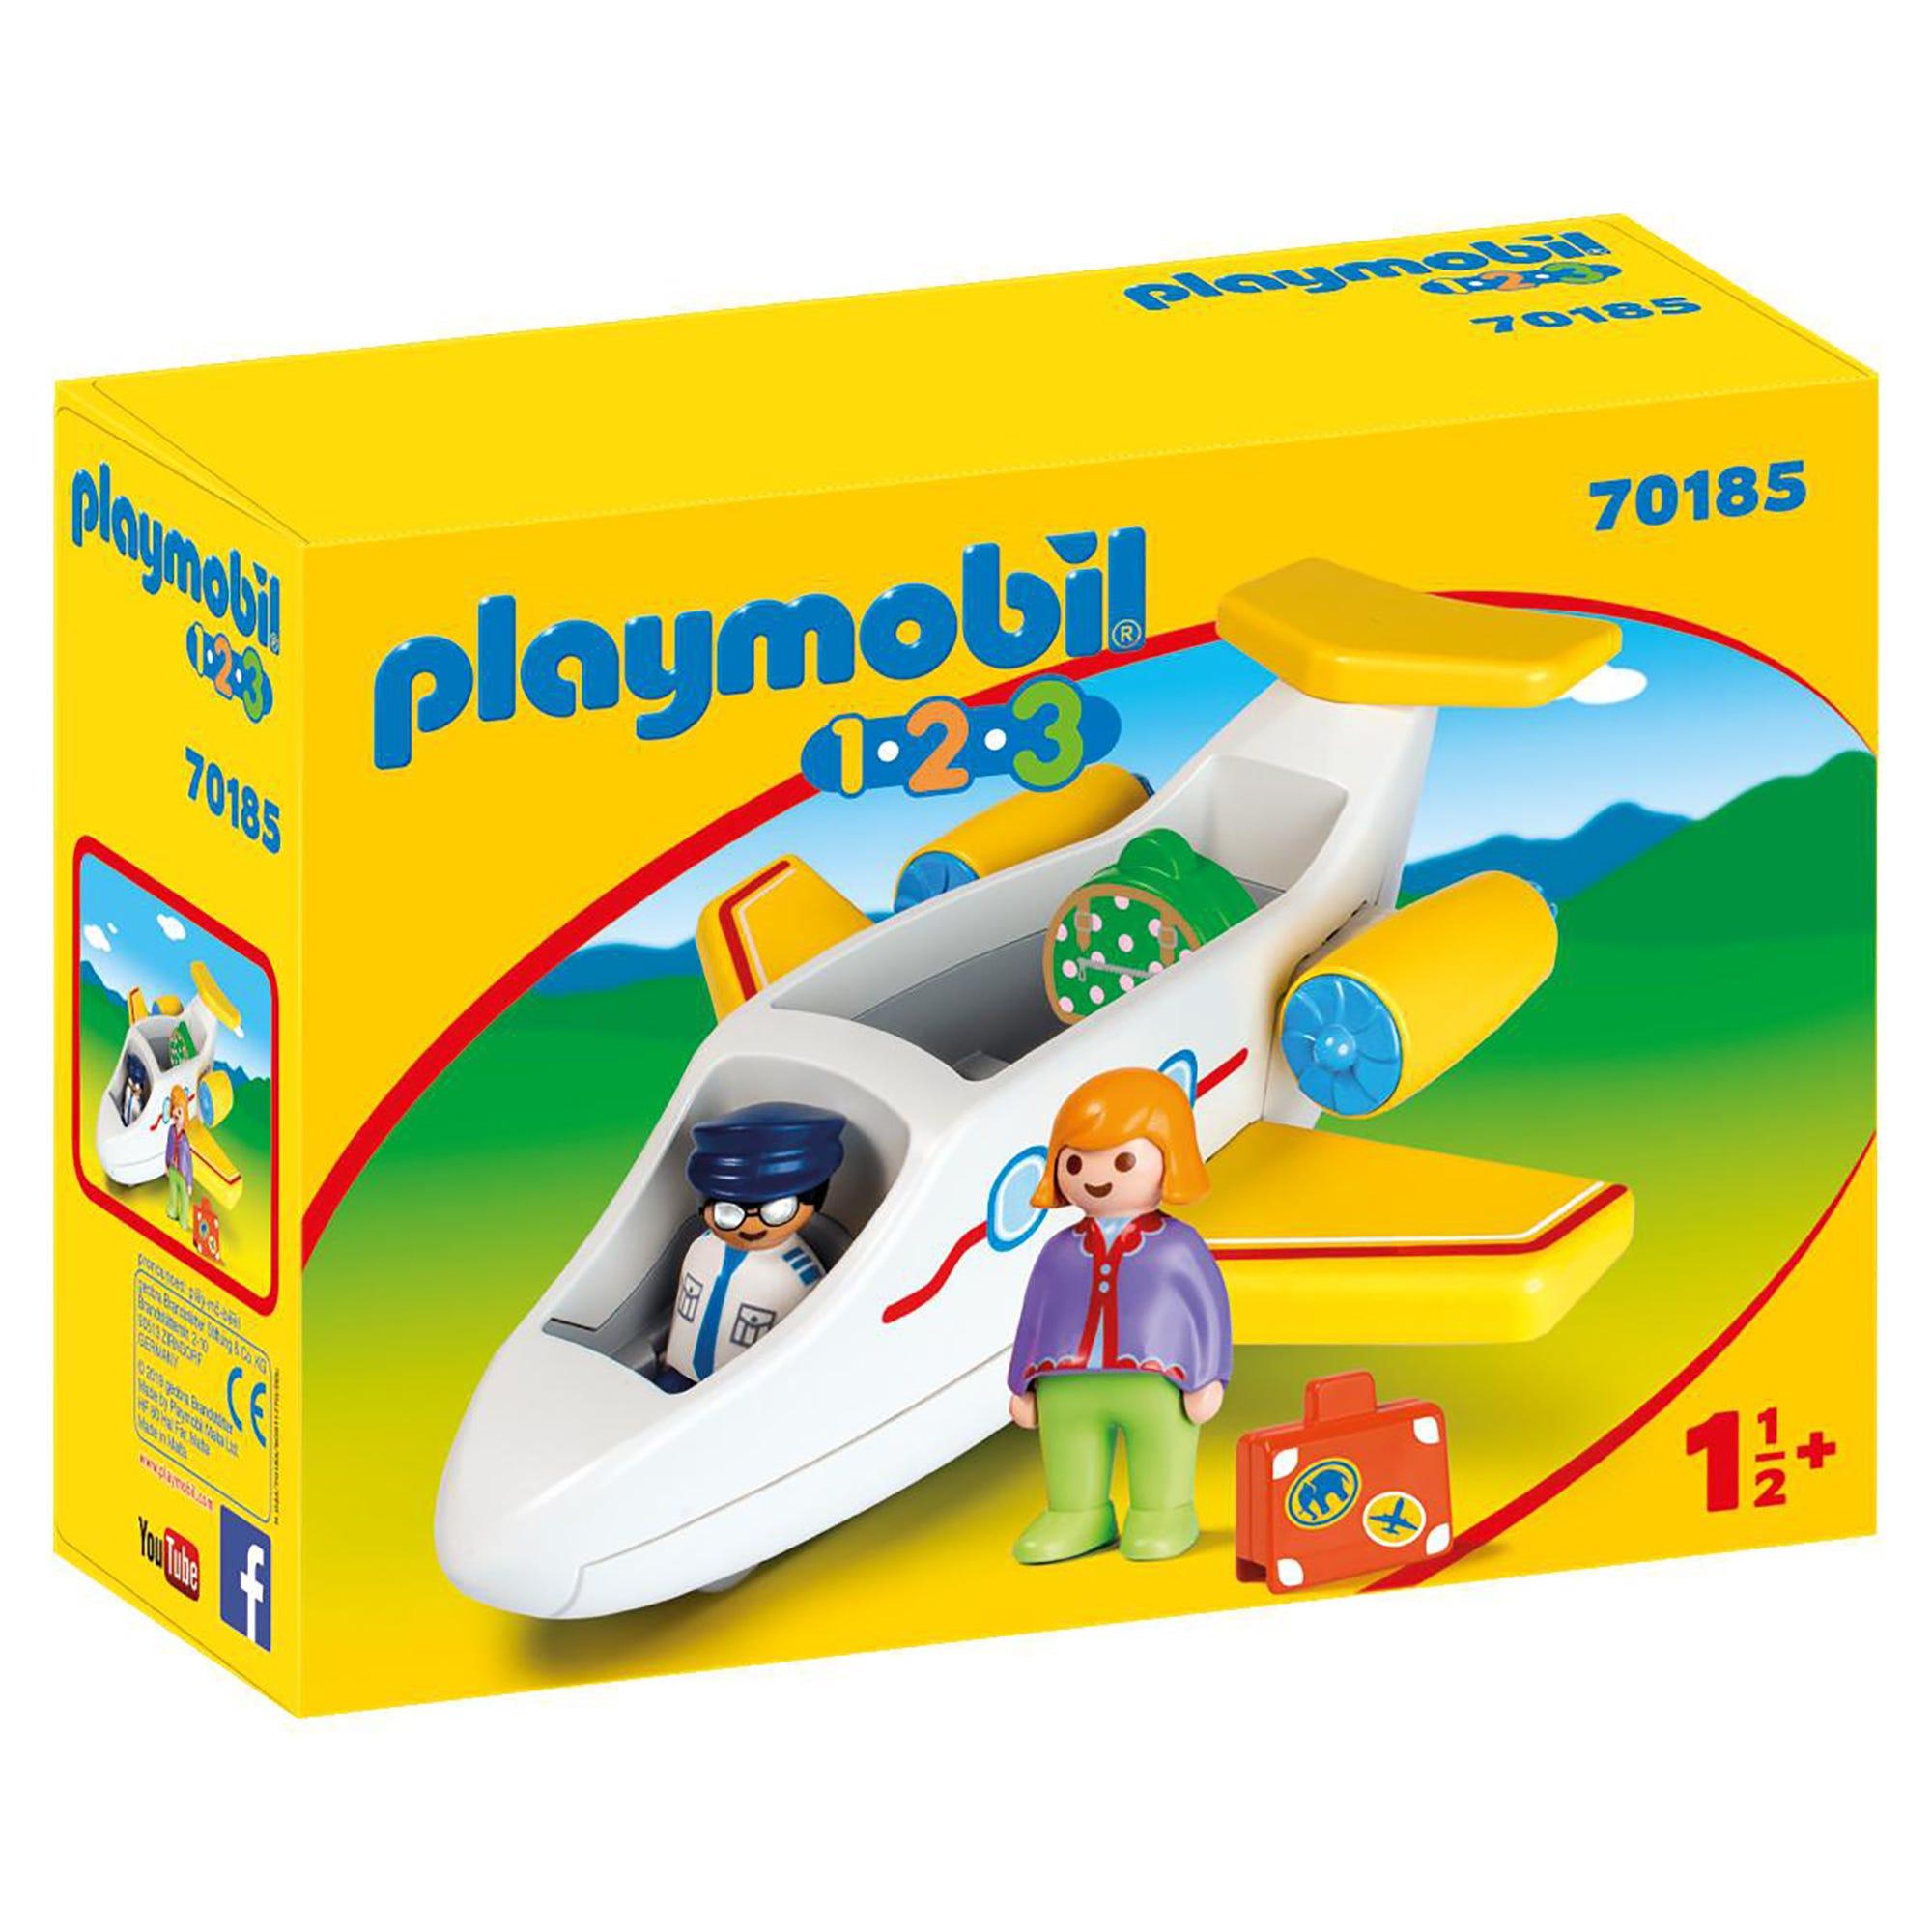 Playmobil 70185 1.2.3 Airplane with Passenger